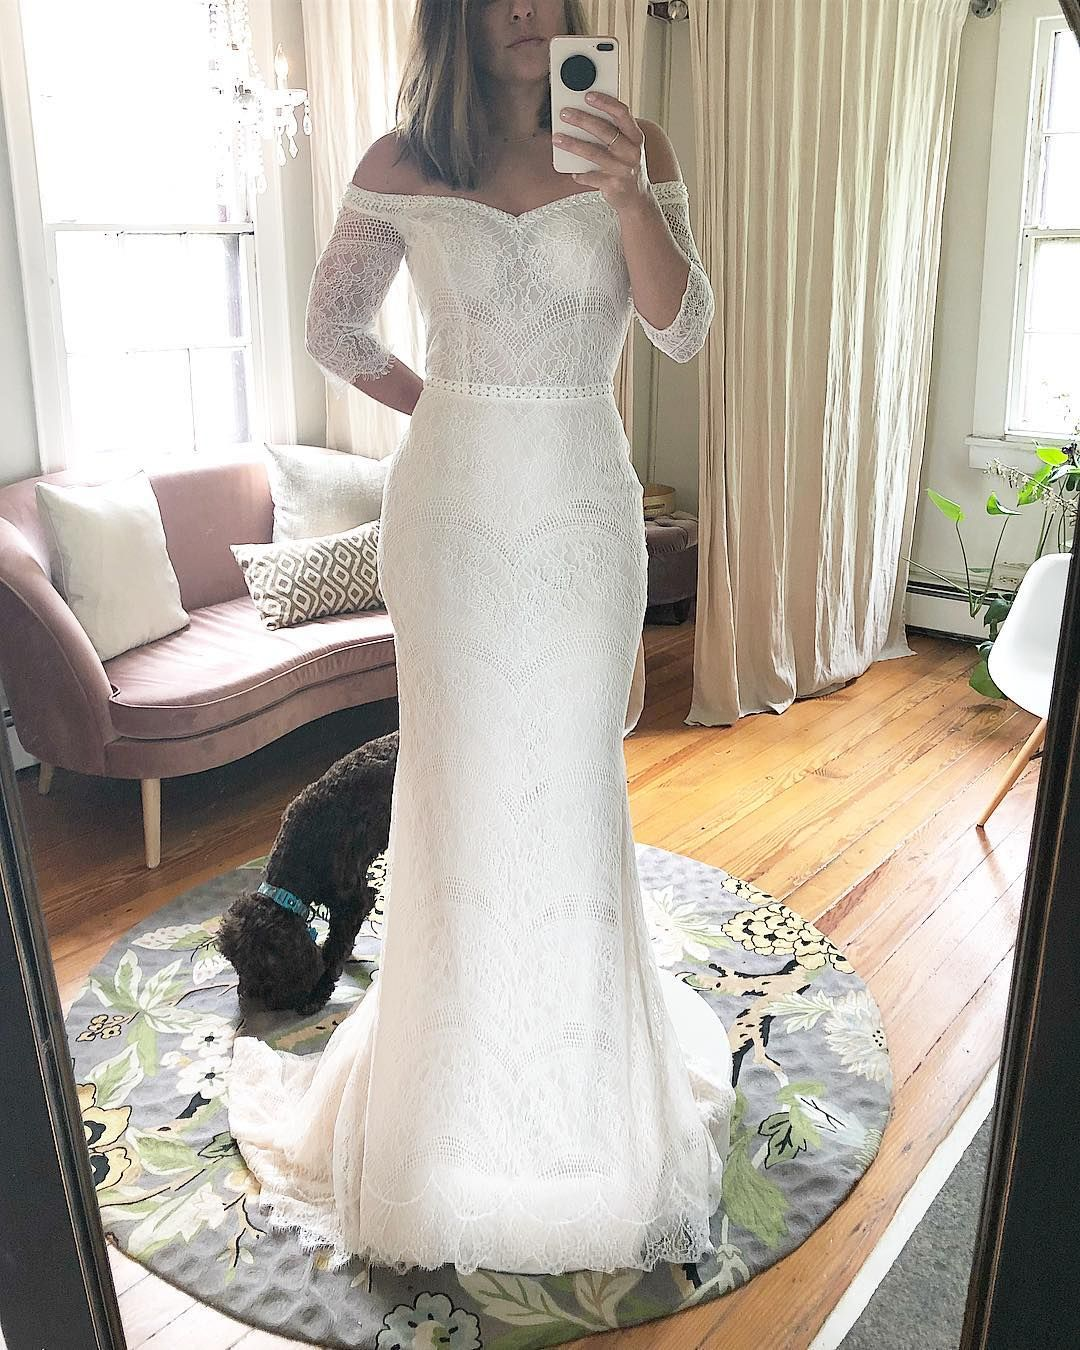 Everthine Bride Everthinebridal Instagram Photos And Videos Flora Bridal Everthine Bride Madison Ct Designer Bridal Gowns Flora Bridal Wedding Dresses